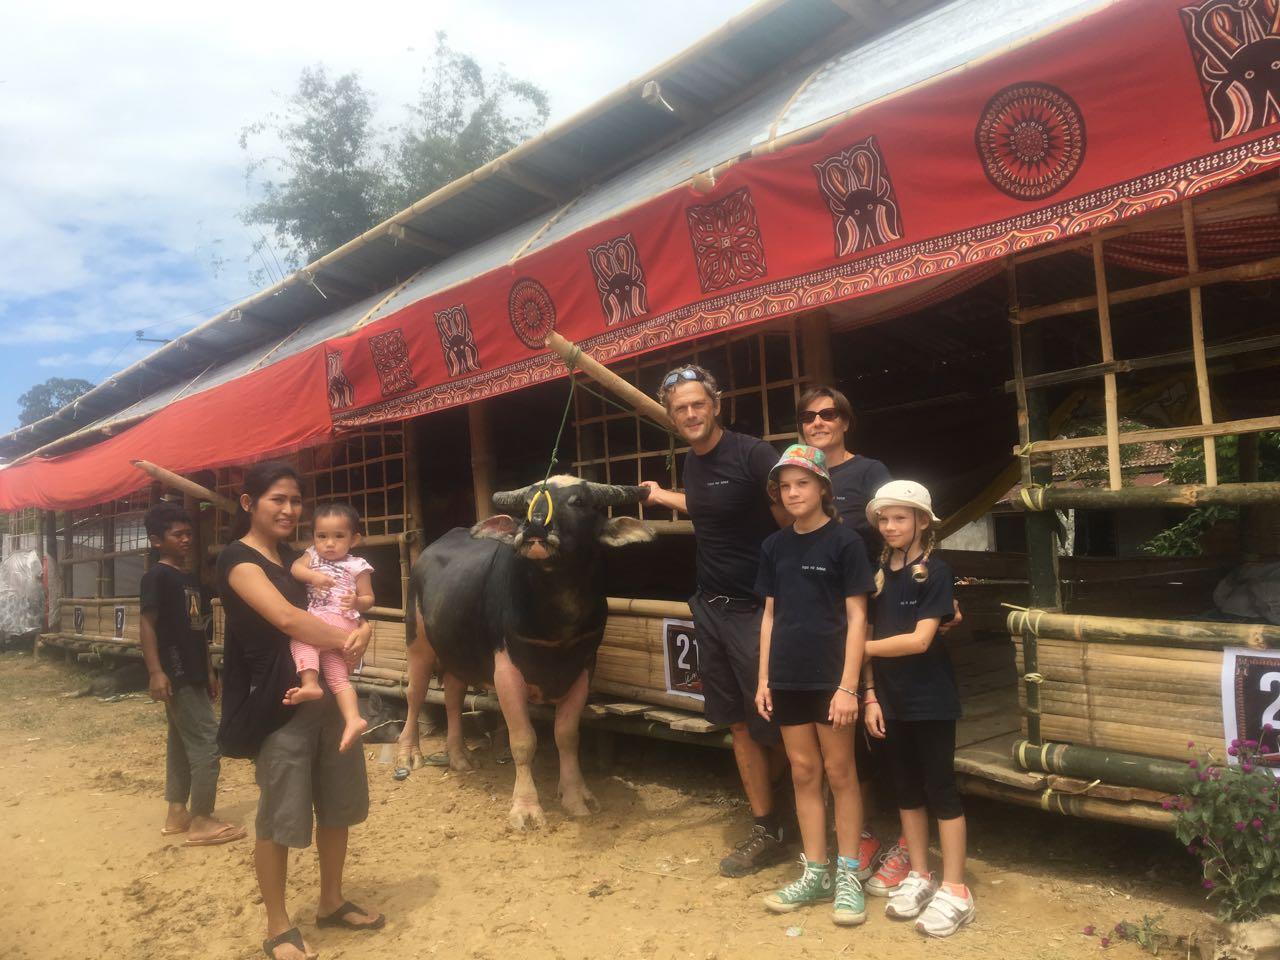 Familienporträt der hapa na sasa crew mit Büffel hier in Tana Toraja